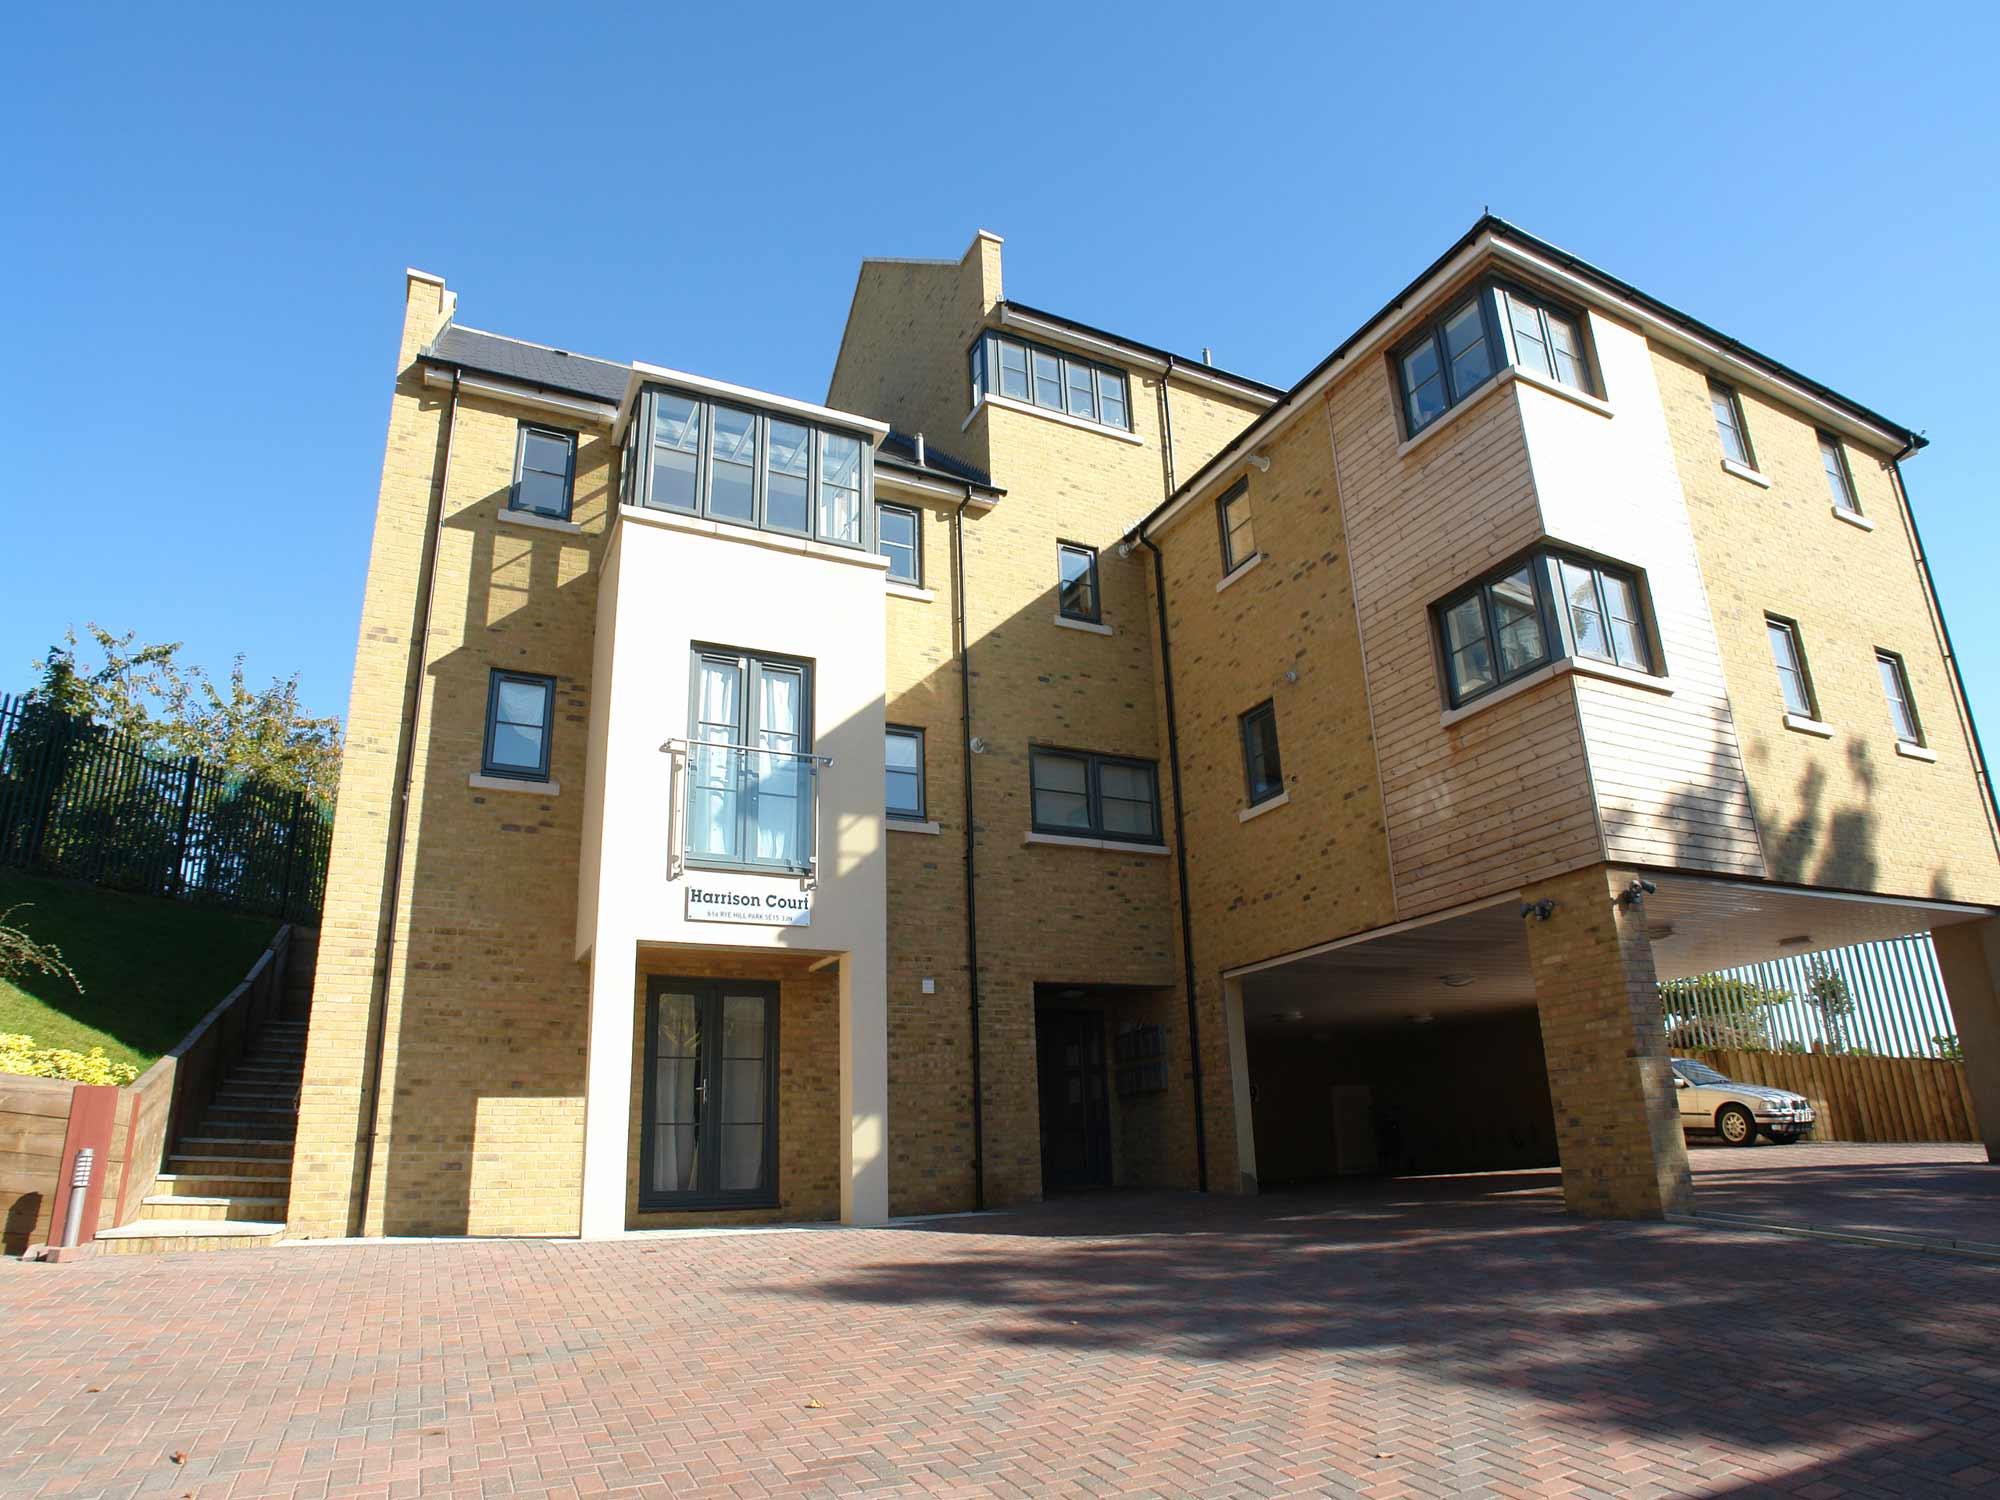 Stoneridge homes ltd building contractor london south east for Stoneridge builders